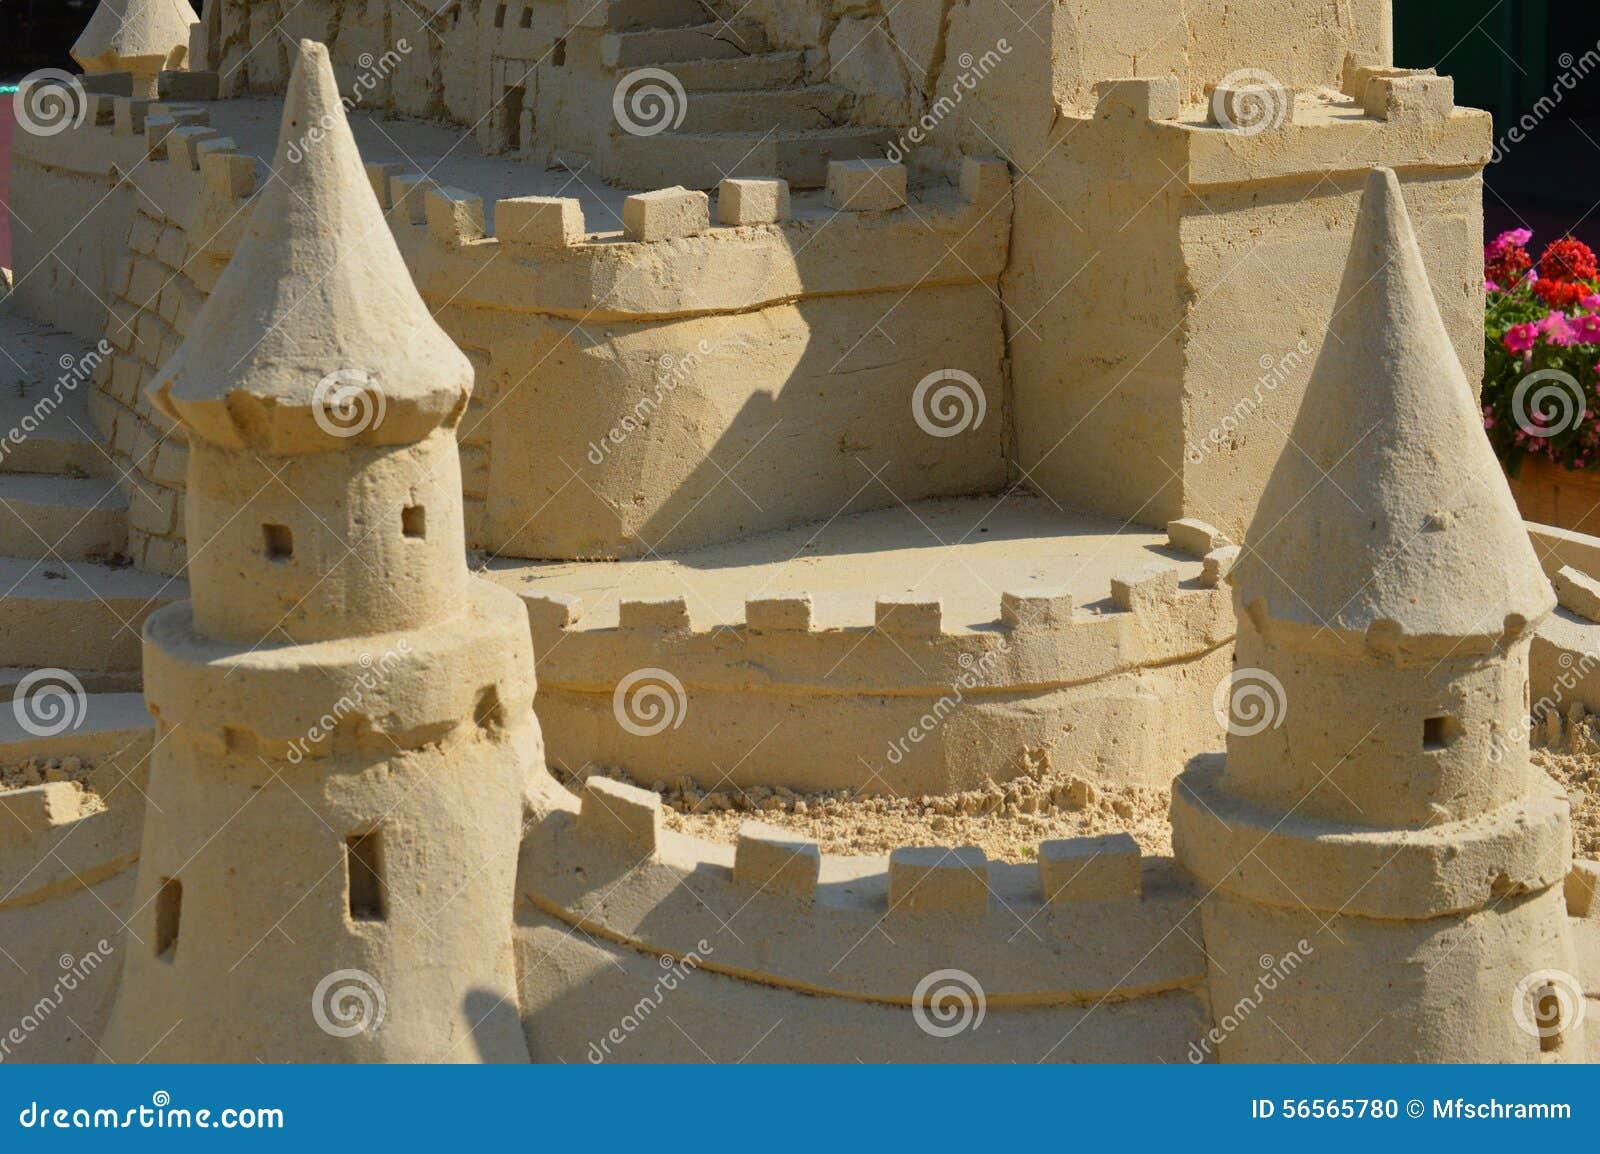 Download η γίνοντη κάστρο άμμος παραλιών σμιλεύει τη μορφή Στοκ Εικόνες - εικόνα από θάλασσα, γλυπτό: 56565780